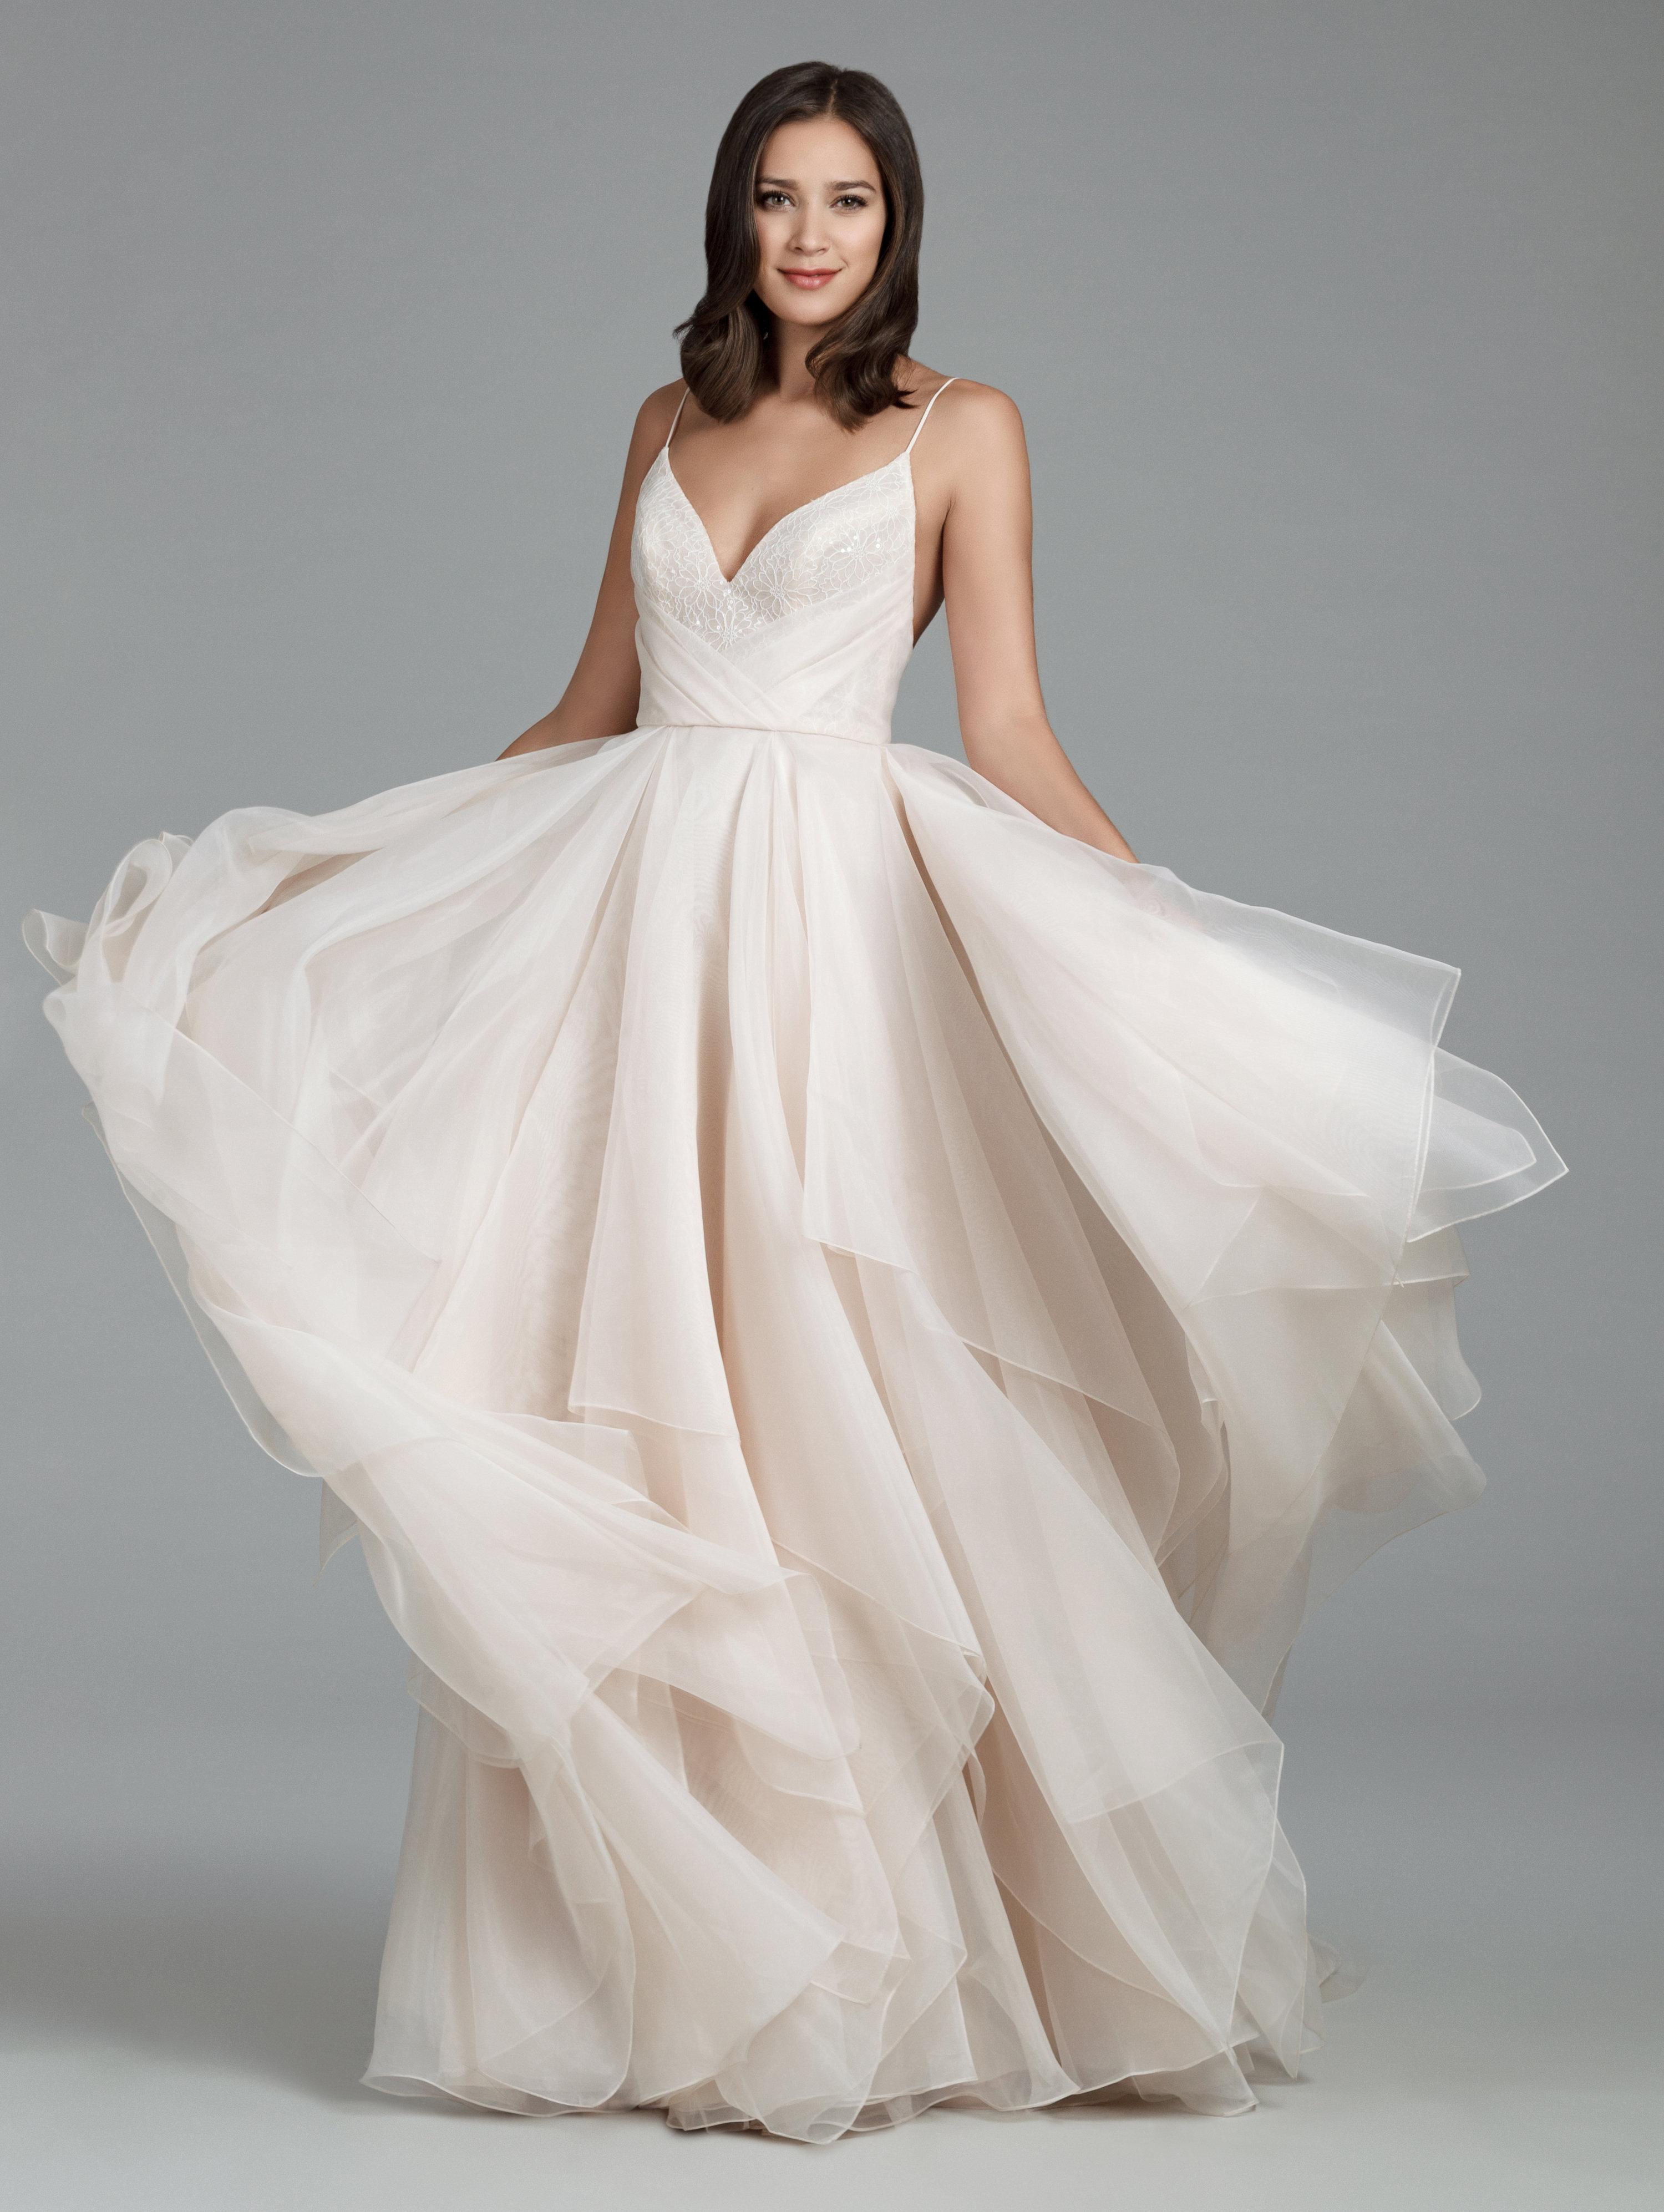 Tara Keely 2018 Wedding Dress